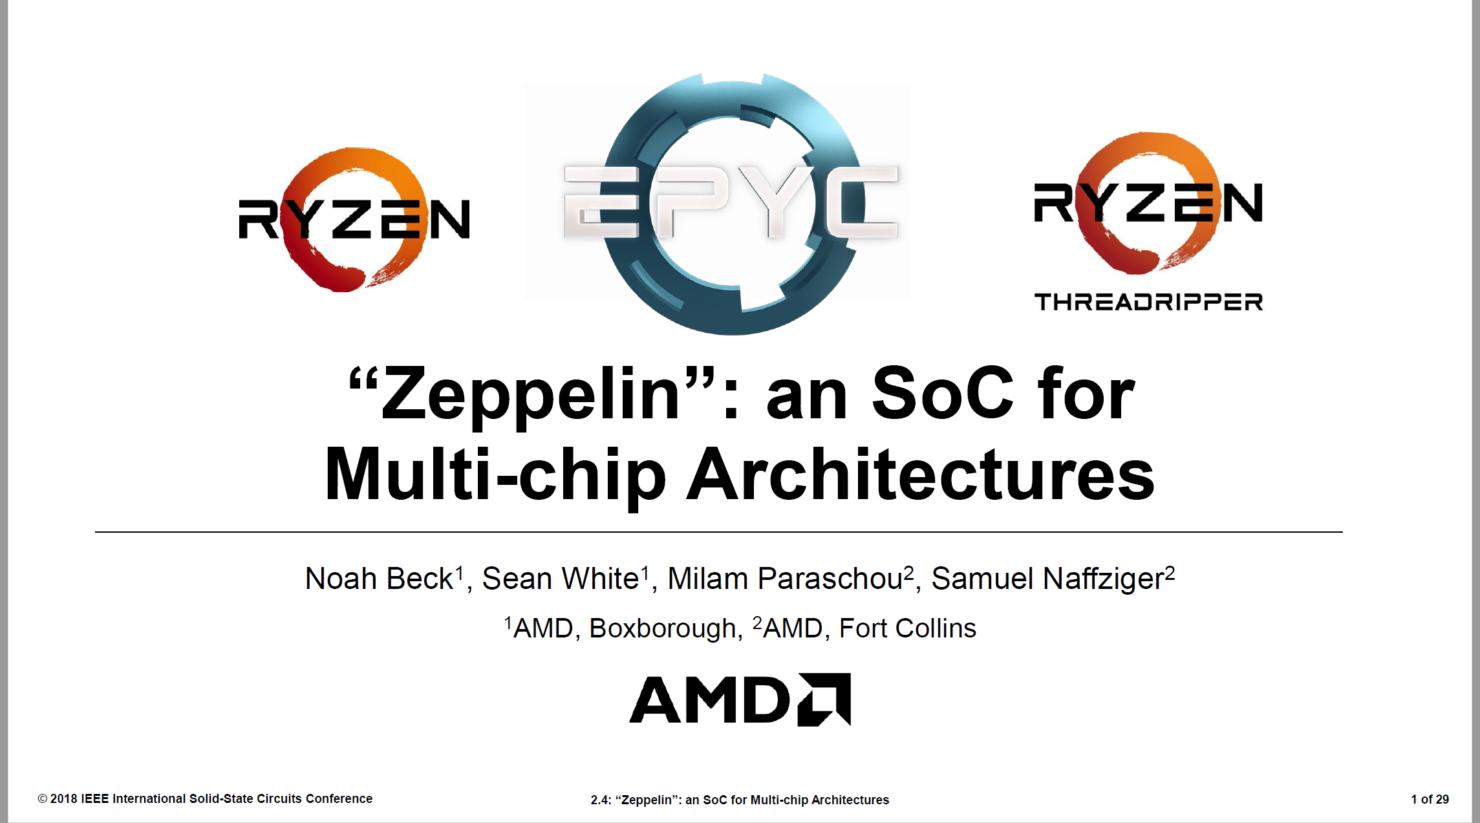 amd-isscc-zeppelin-zen-epyc-threadripper-ryzen_1